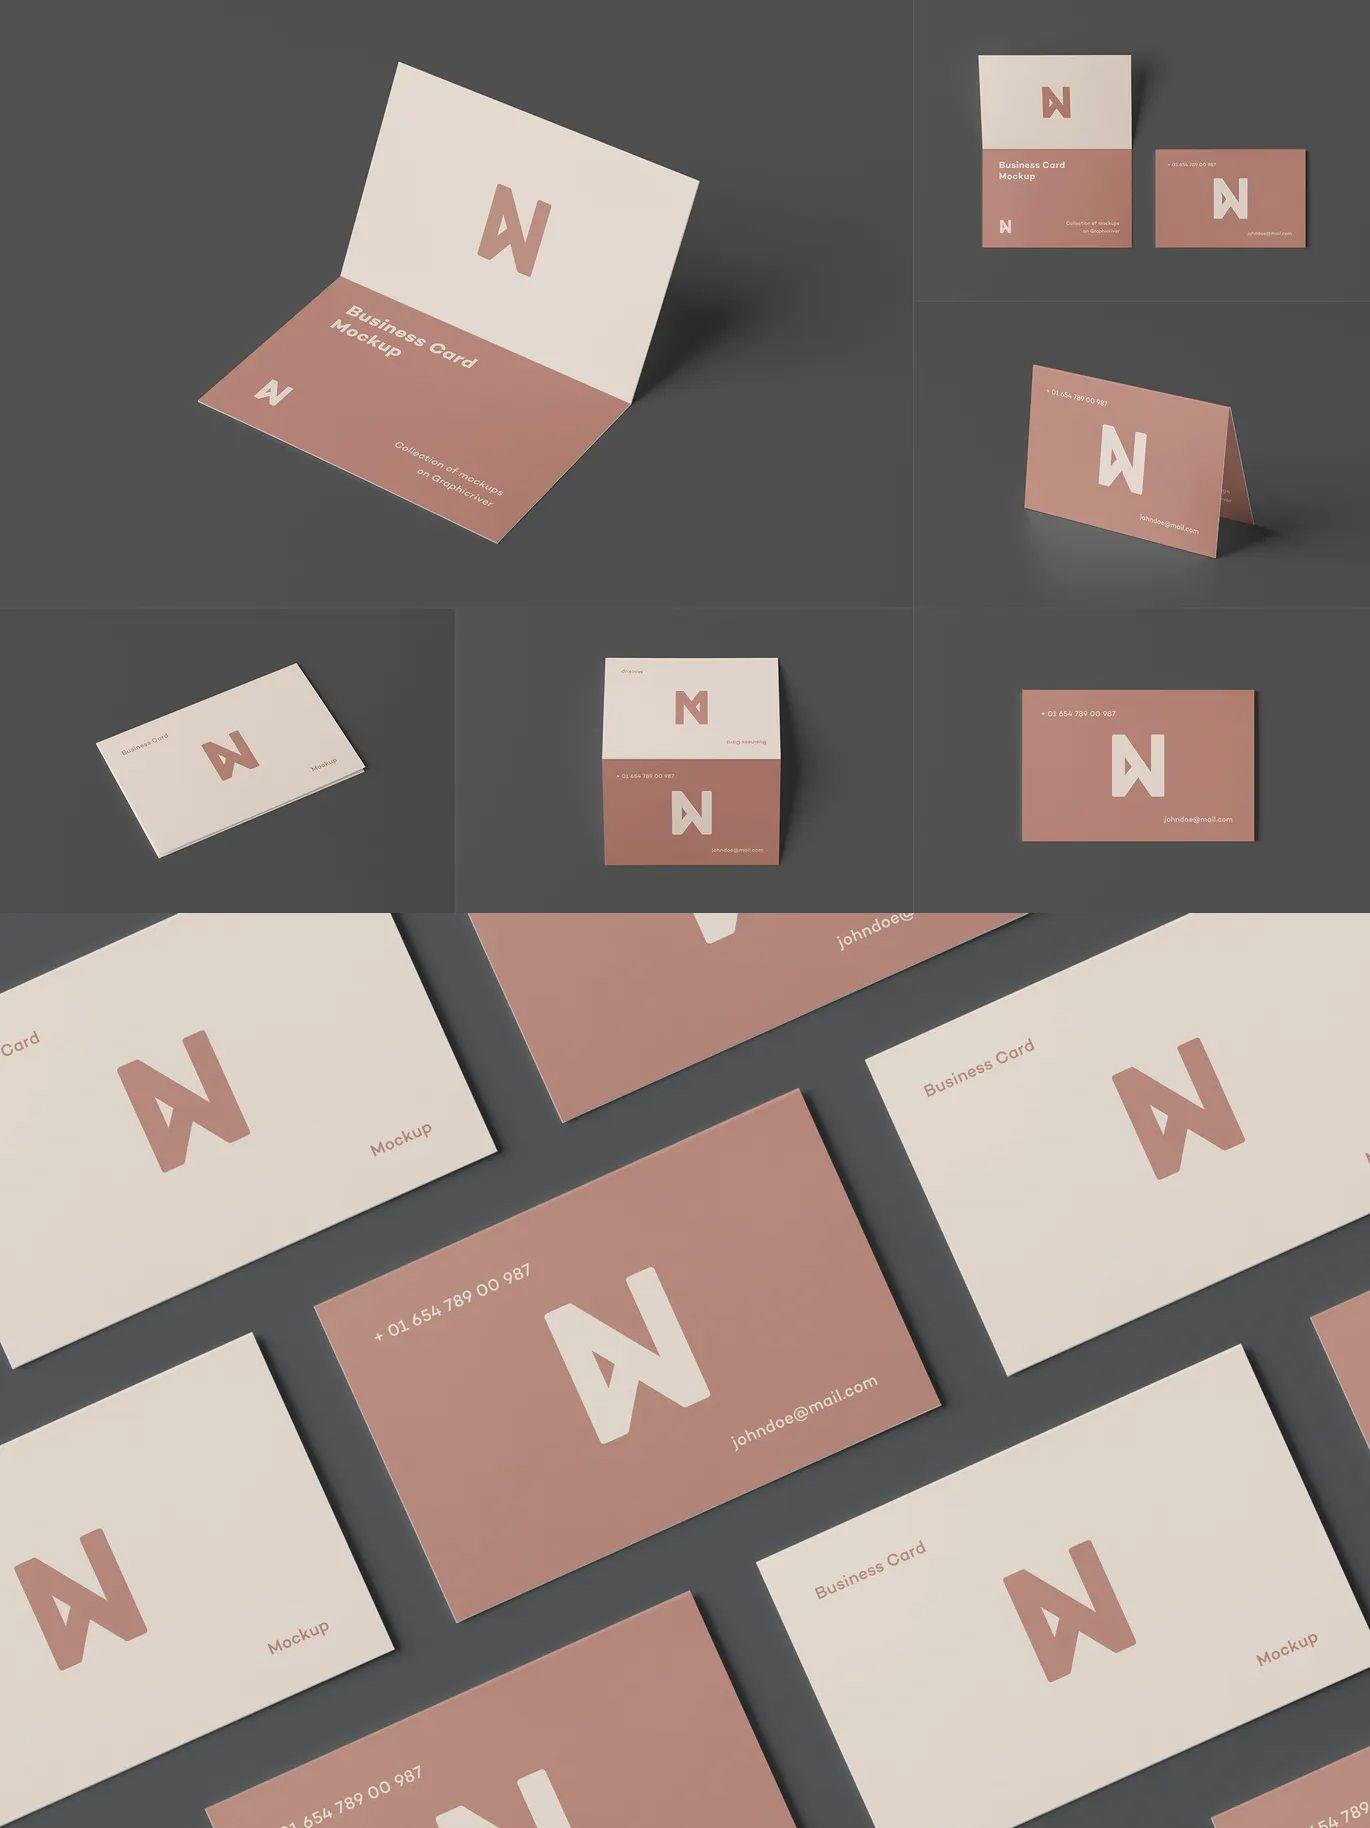 Bi Fold Business Card Mock Up By Yogurt86 On Envato Elements Folded Business Cards Business Card Mock Up Business Cards